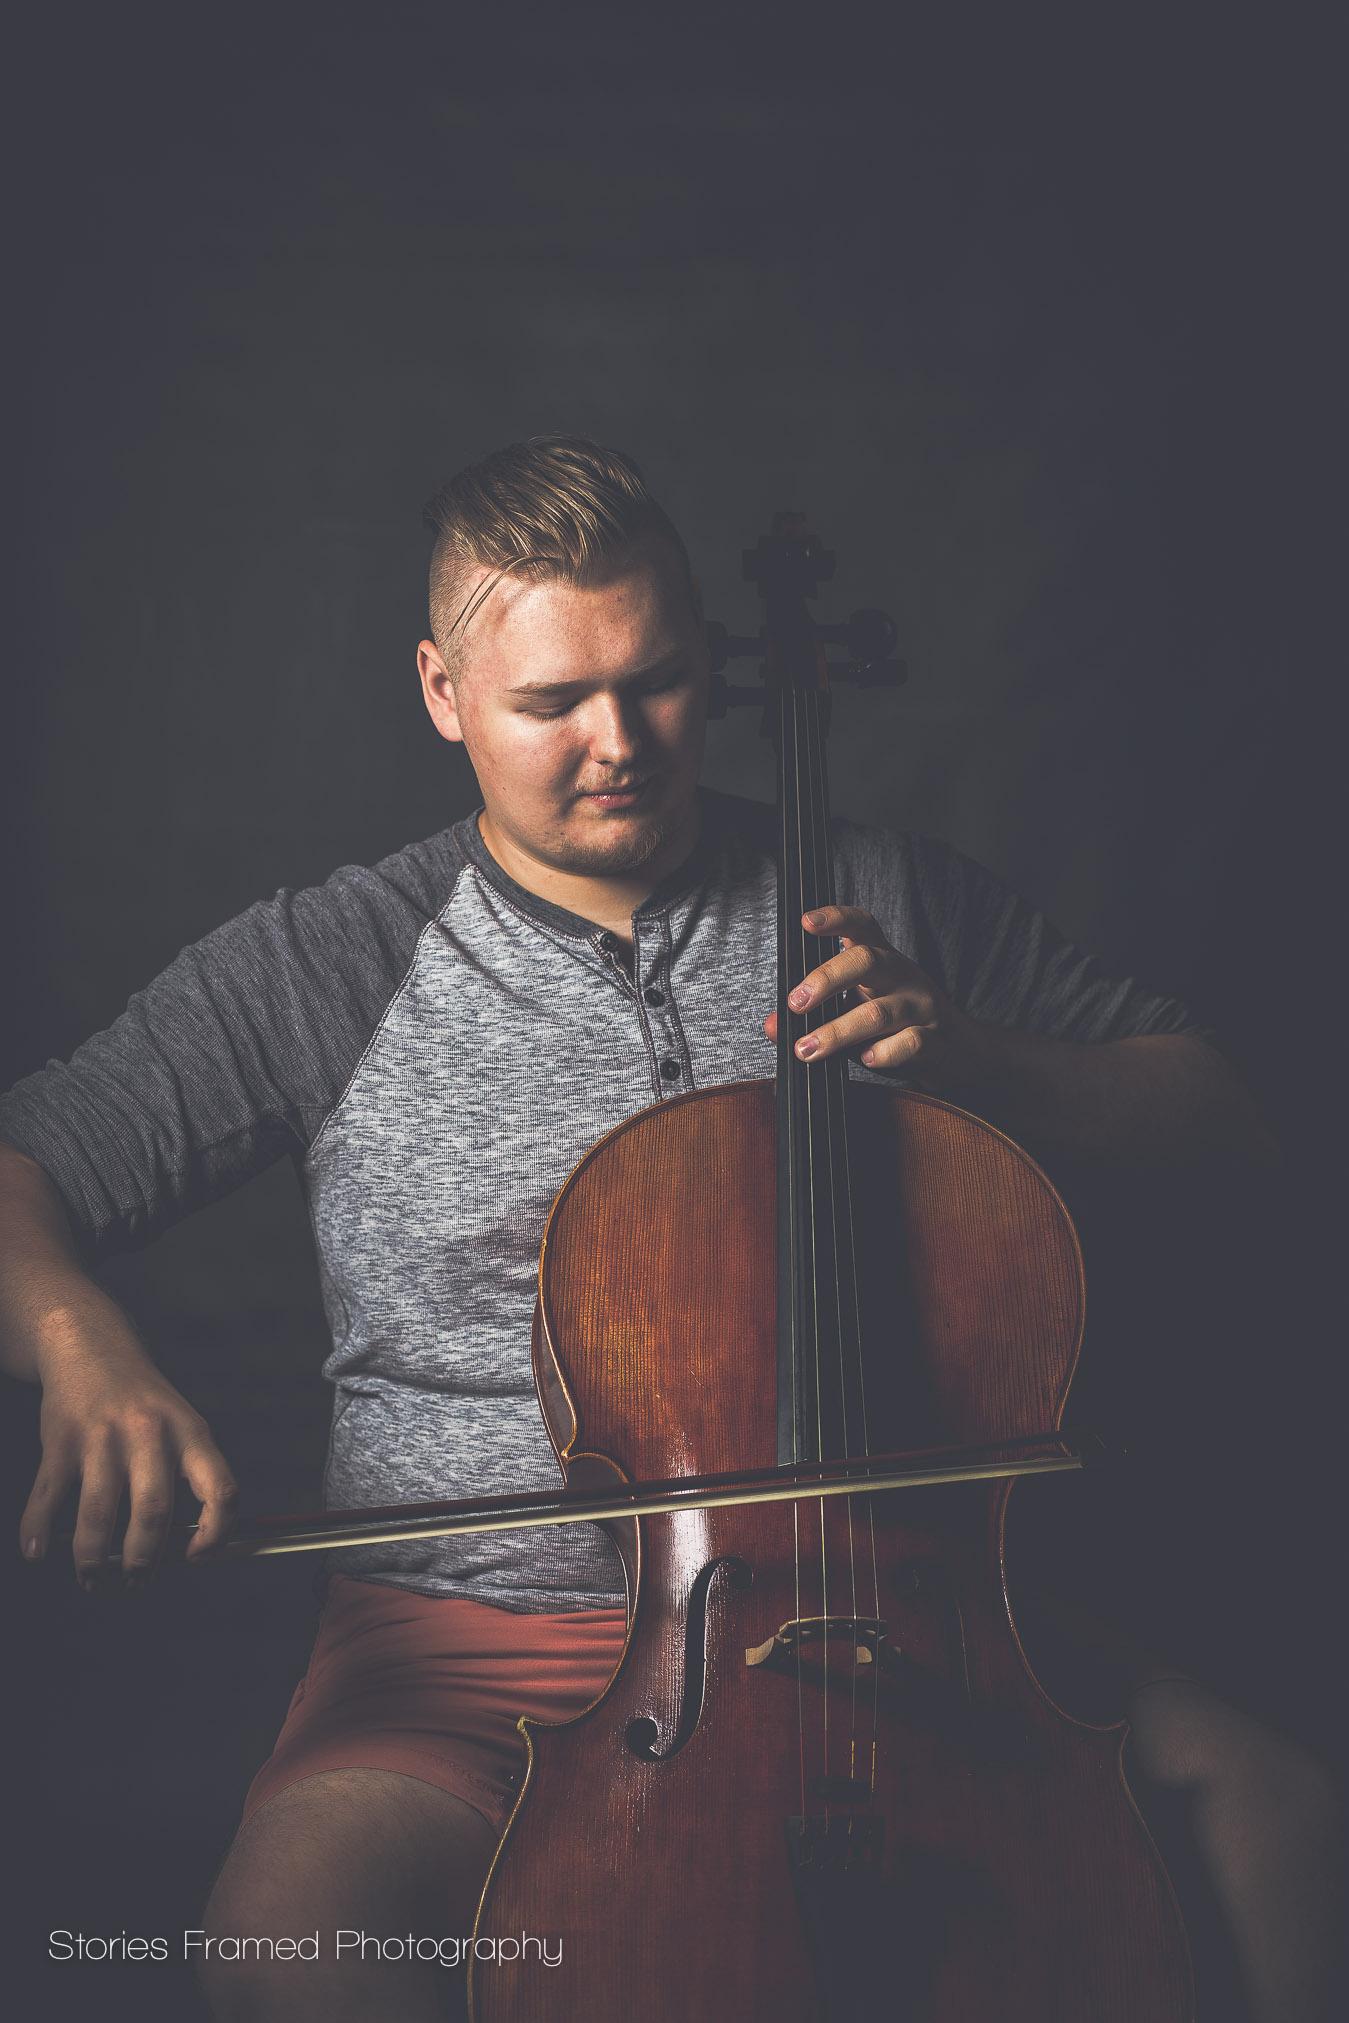 High-school-senior-cello-player.jpg